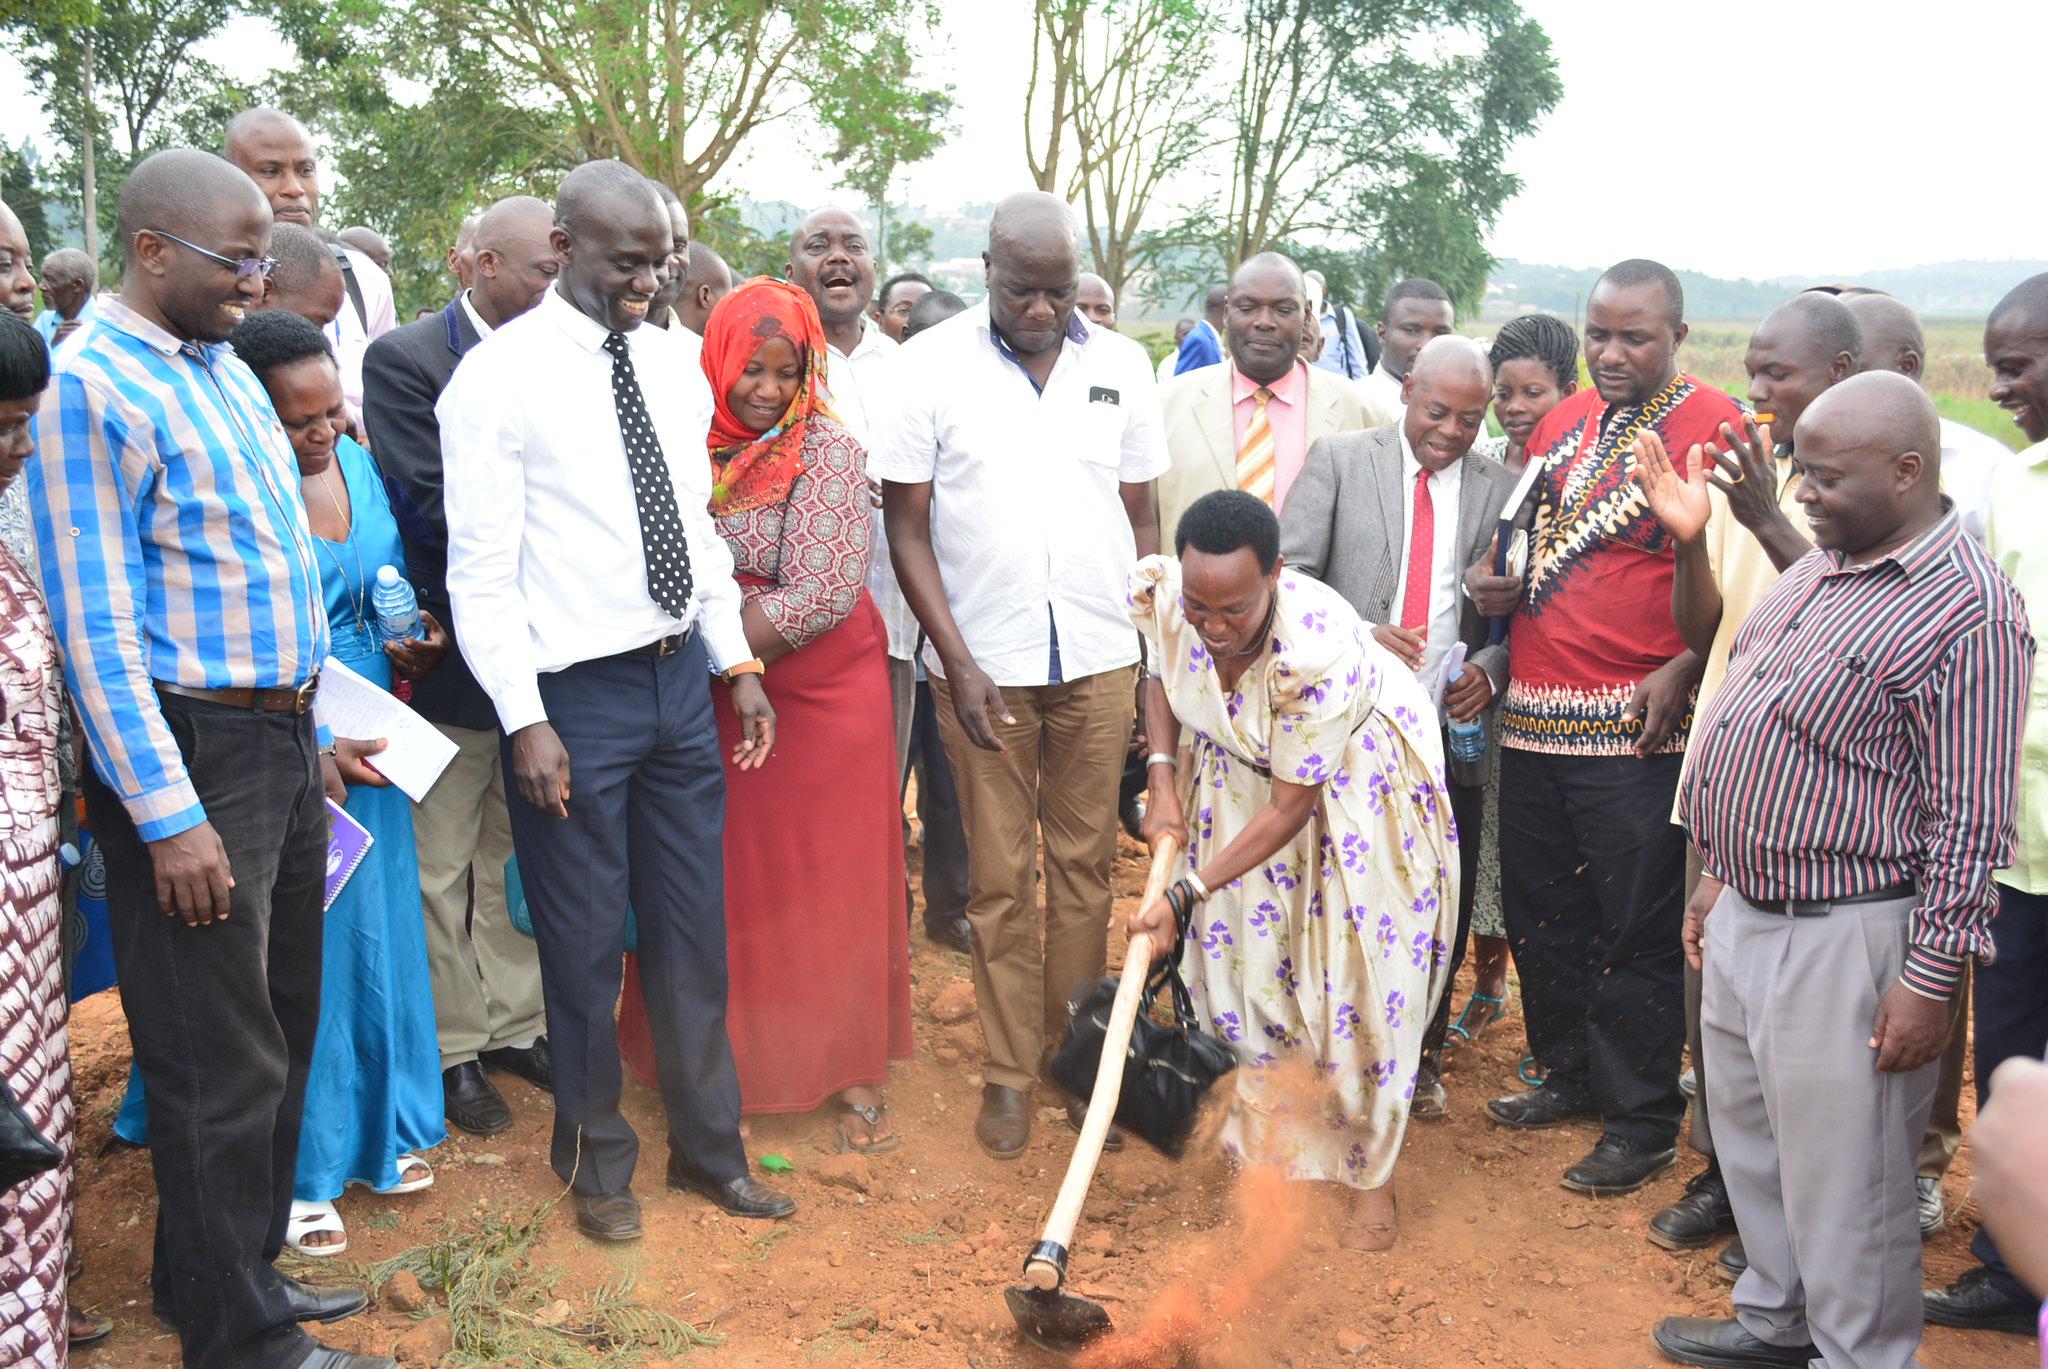 Groundbreaking event for pig abattoir in Masaka, Uganda